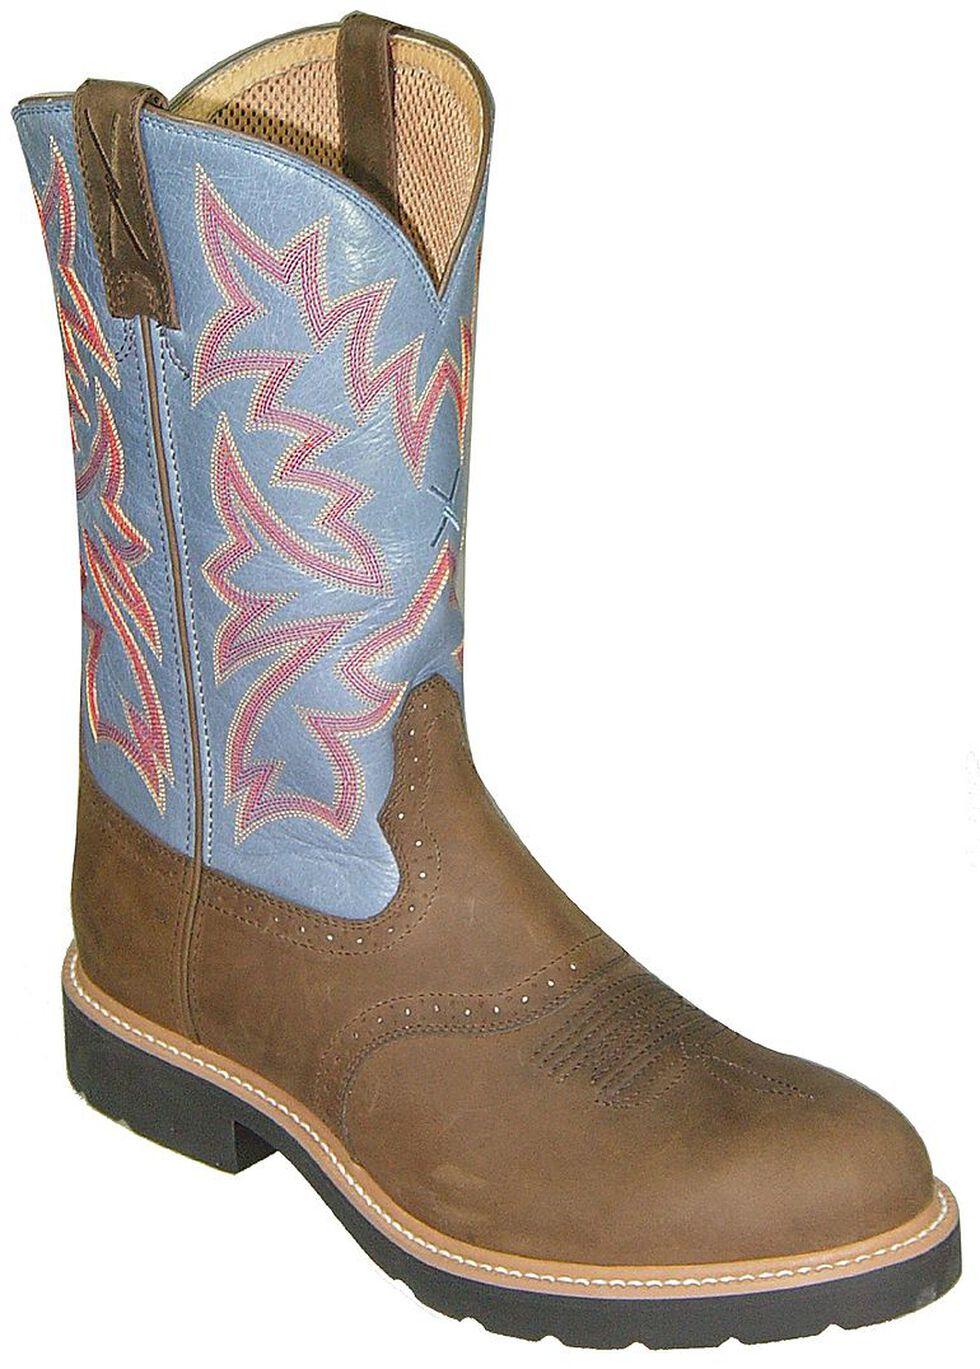 Twisted X Men's Saddle Vamp Pull-On Work Boots - Steel Toe, Saddle Brown, hi-res